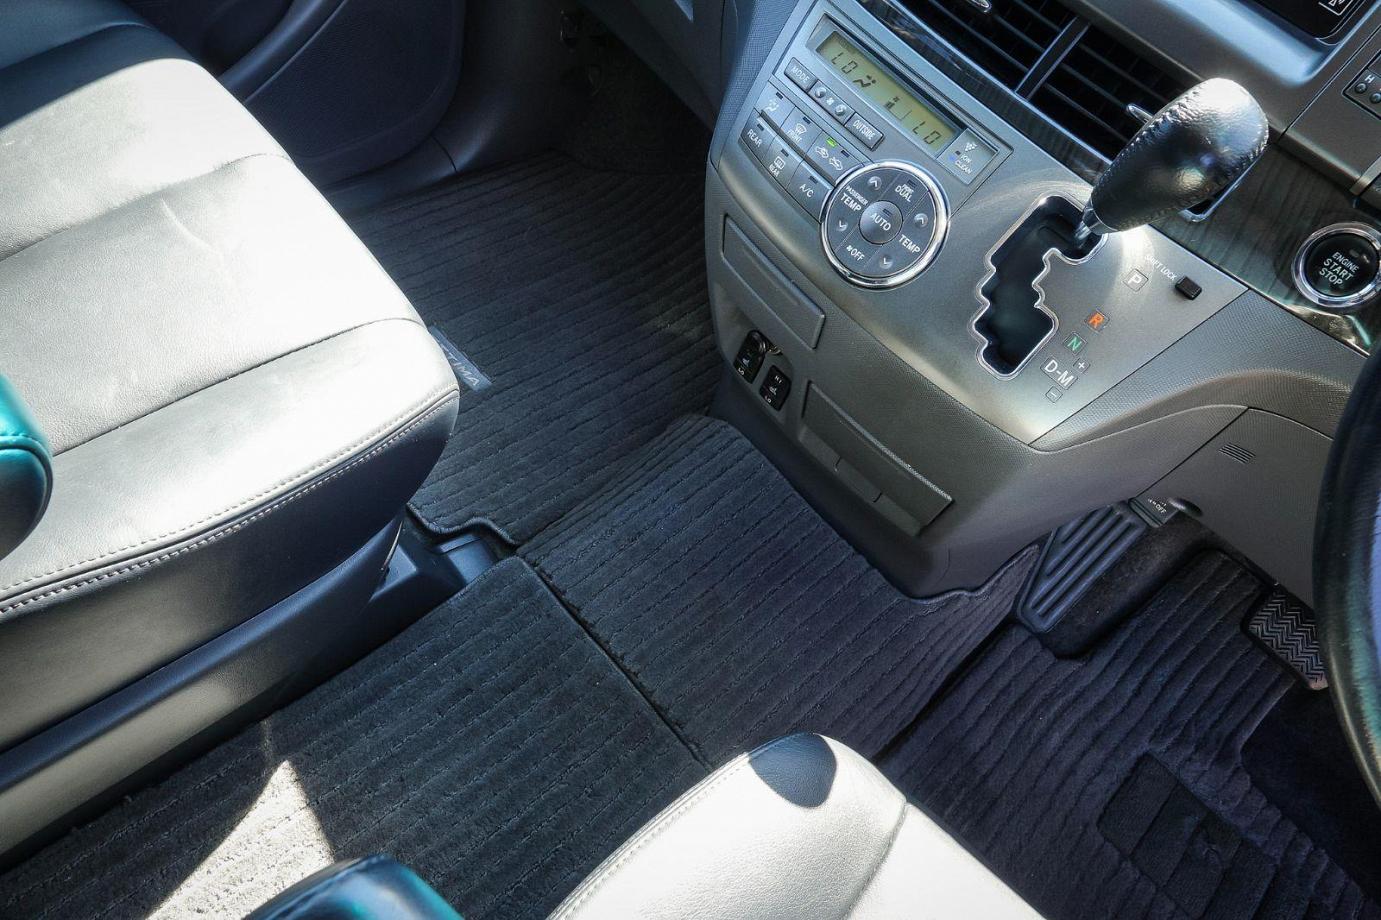 2010 Toyota Estima ACR50 Aeras Leather - Package Wagon 7st 5dr Auto 2.4i